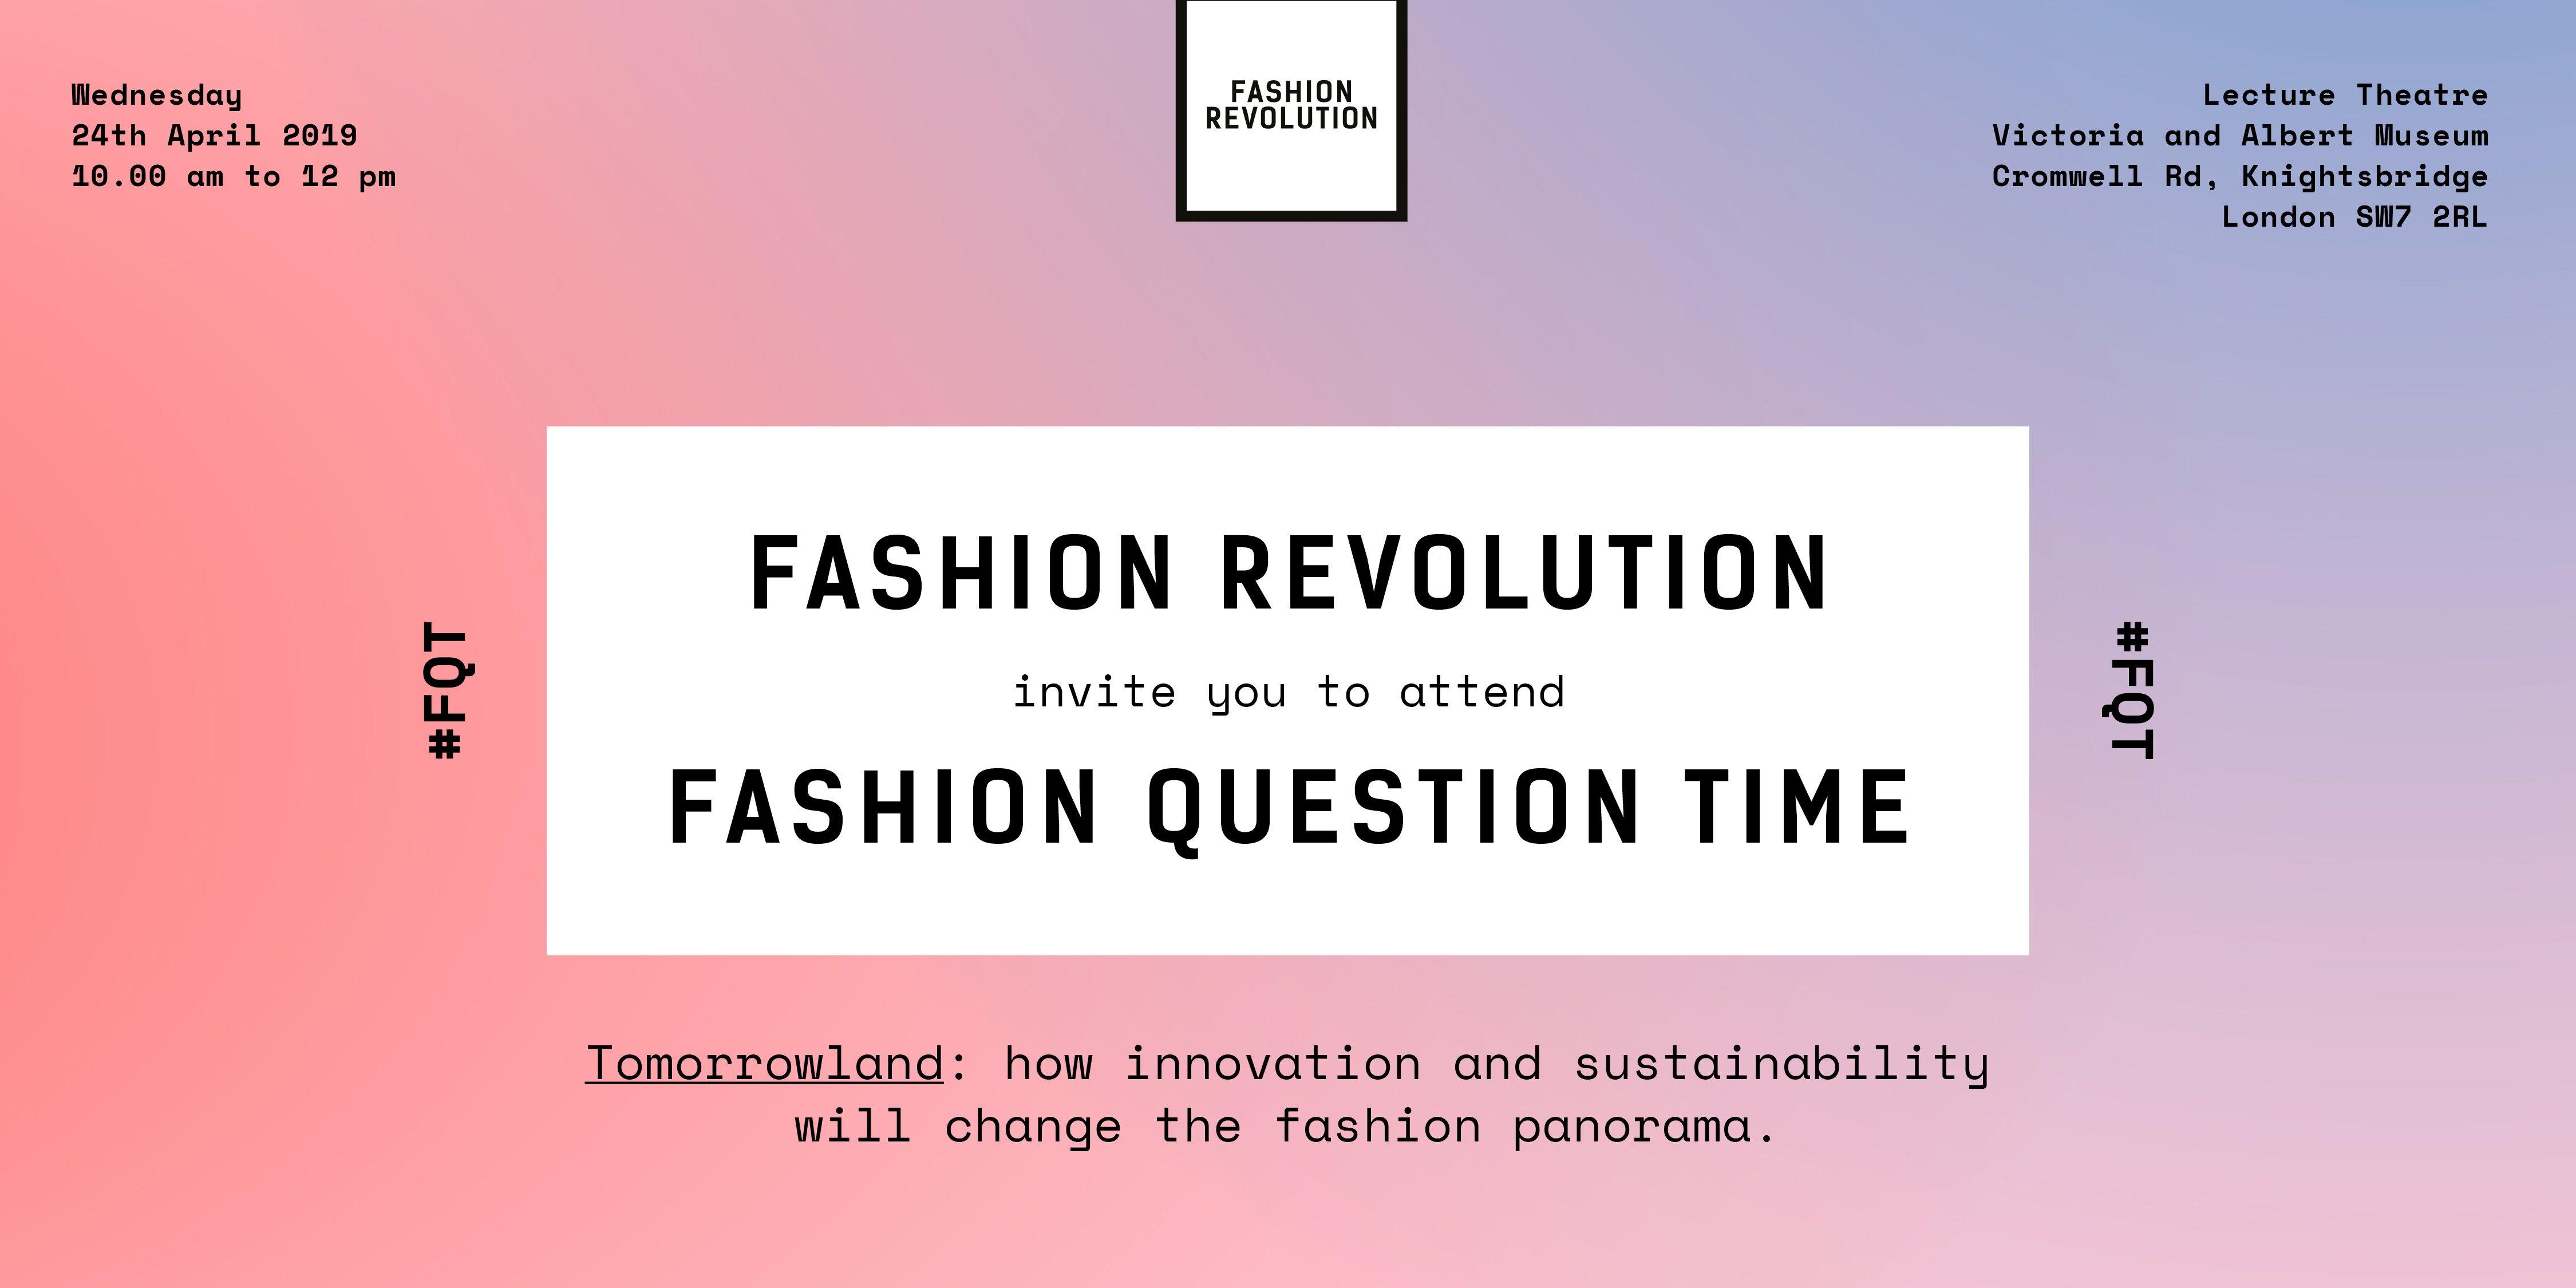 Fashion Question Time At The V&a – Fashion Revolution : Fashion V&a Calendar 2019